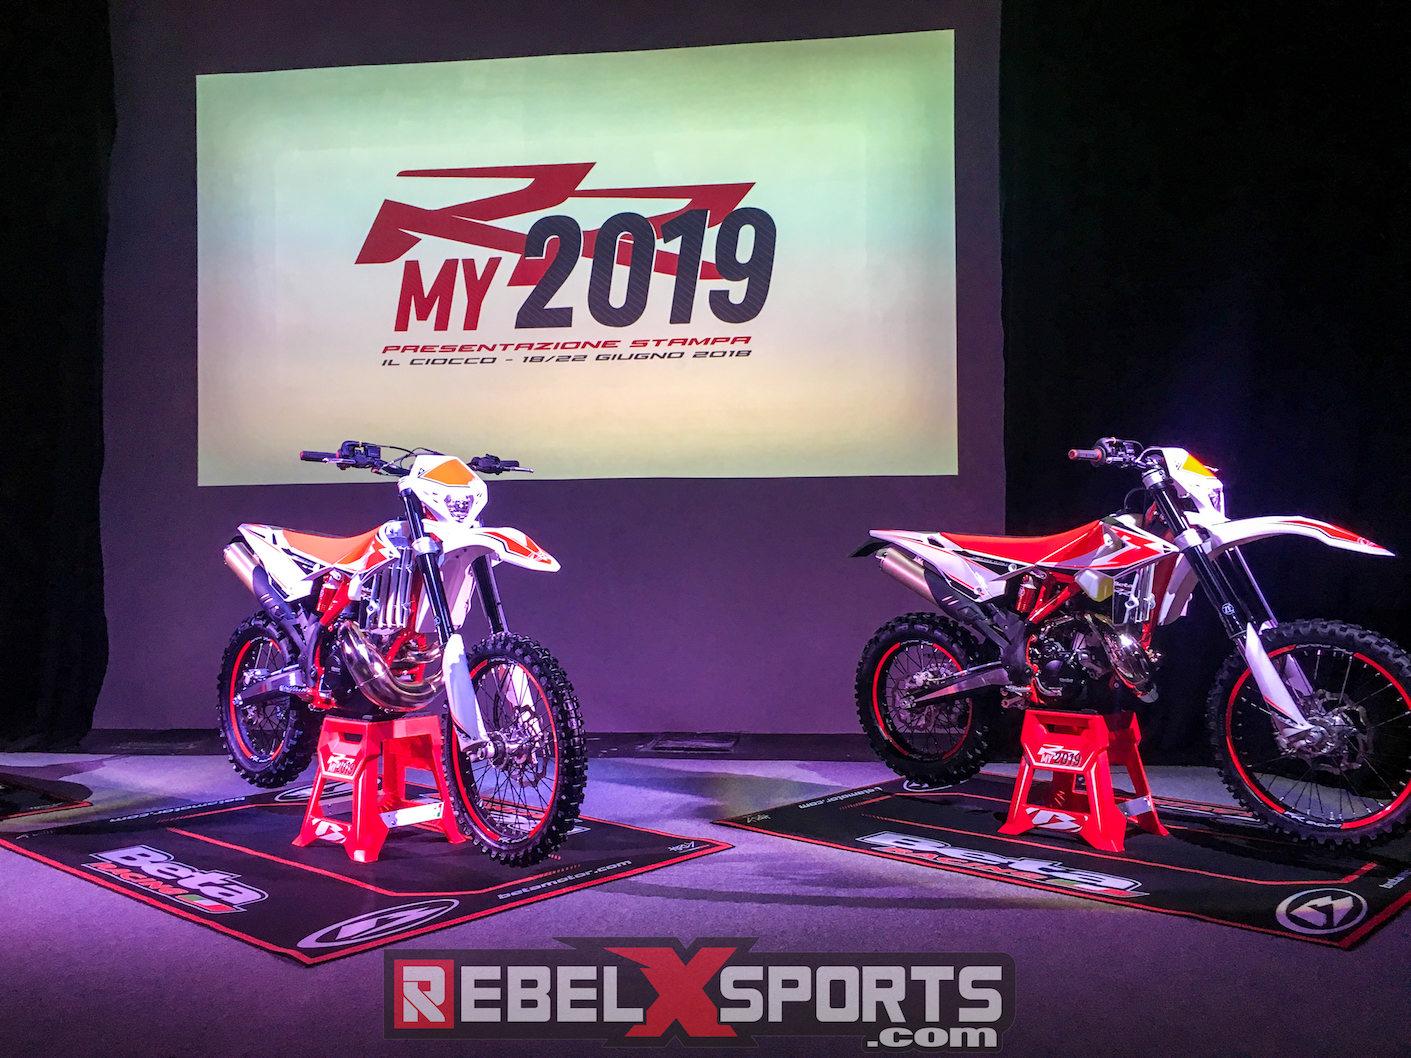 NEW 2019 BETA RR 200cc 2 Stroke and model range – Rebel X Sports Srl